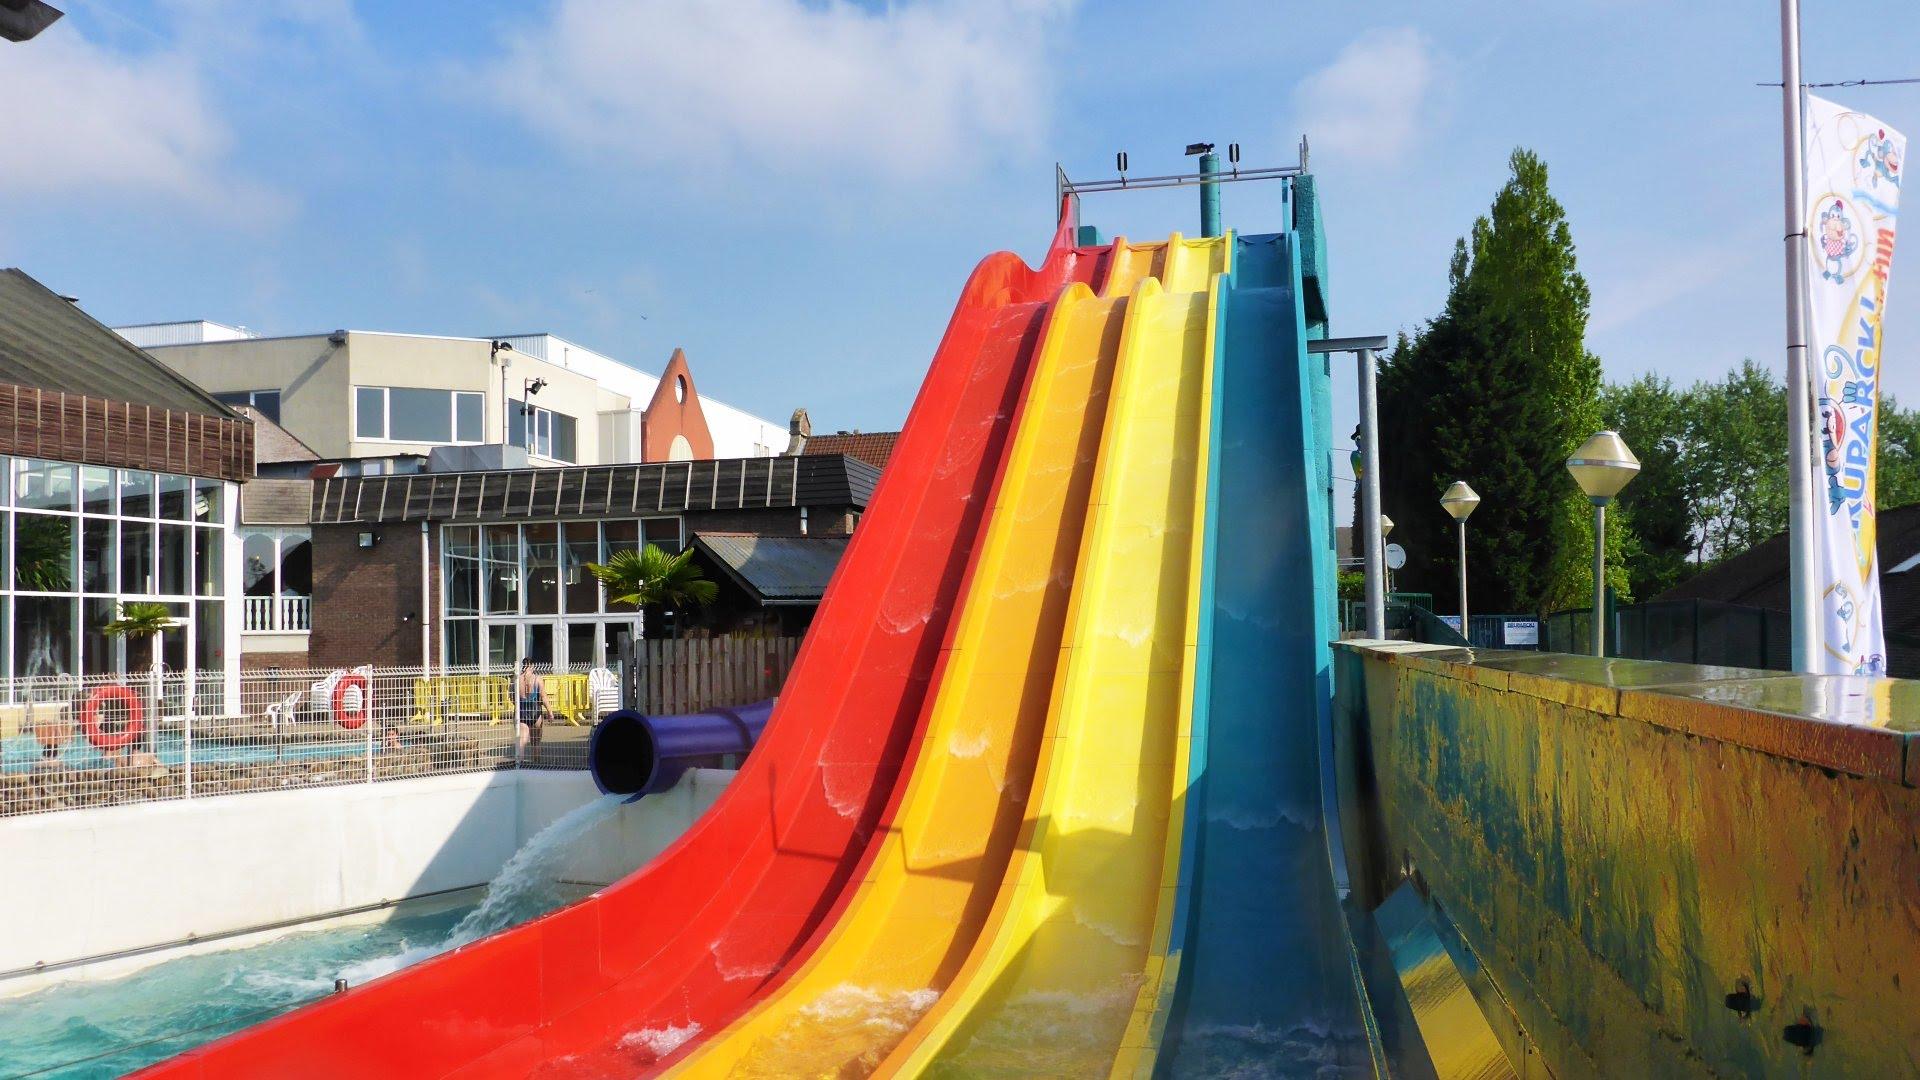 Oceade Brüssel - Salto Angels Multi-Slide Breitrutsche Onride